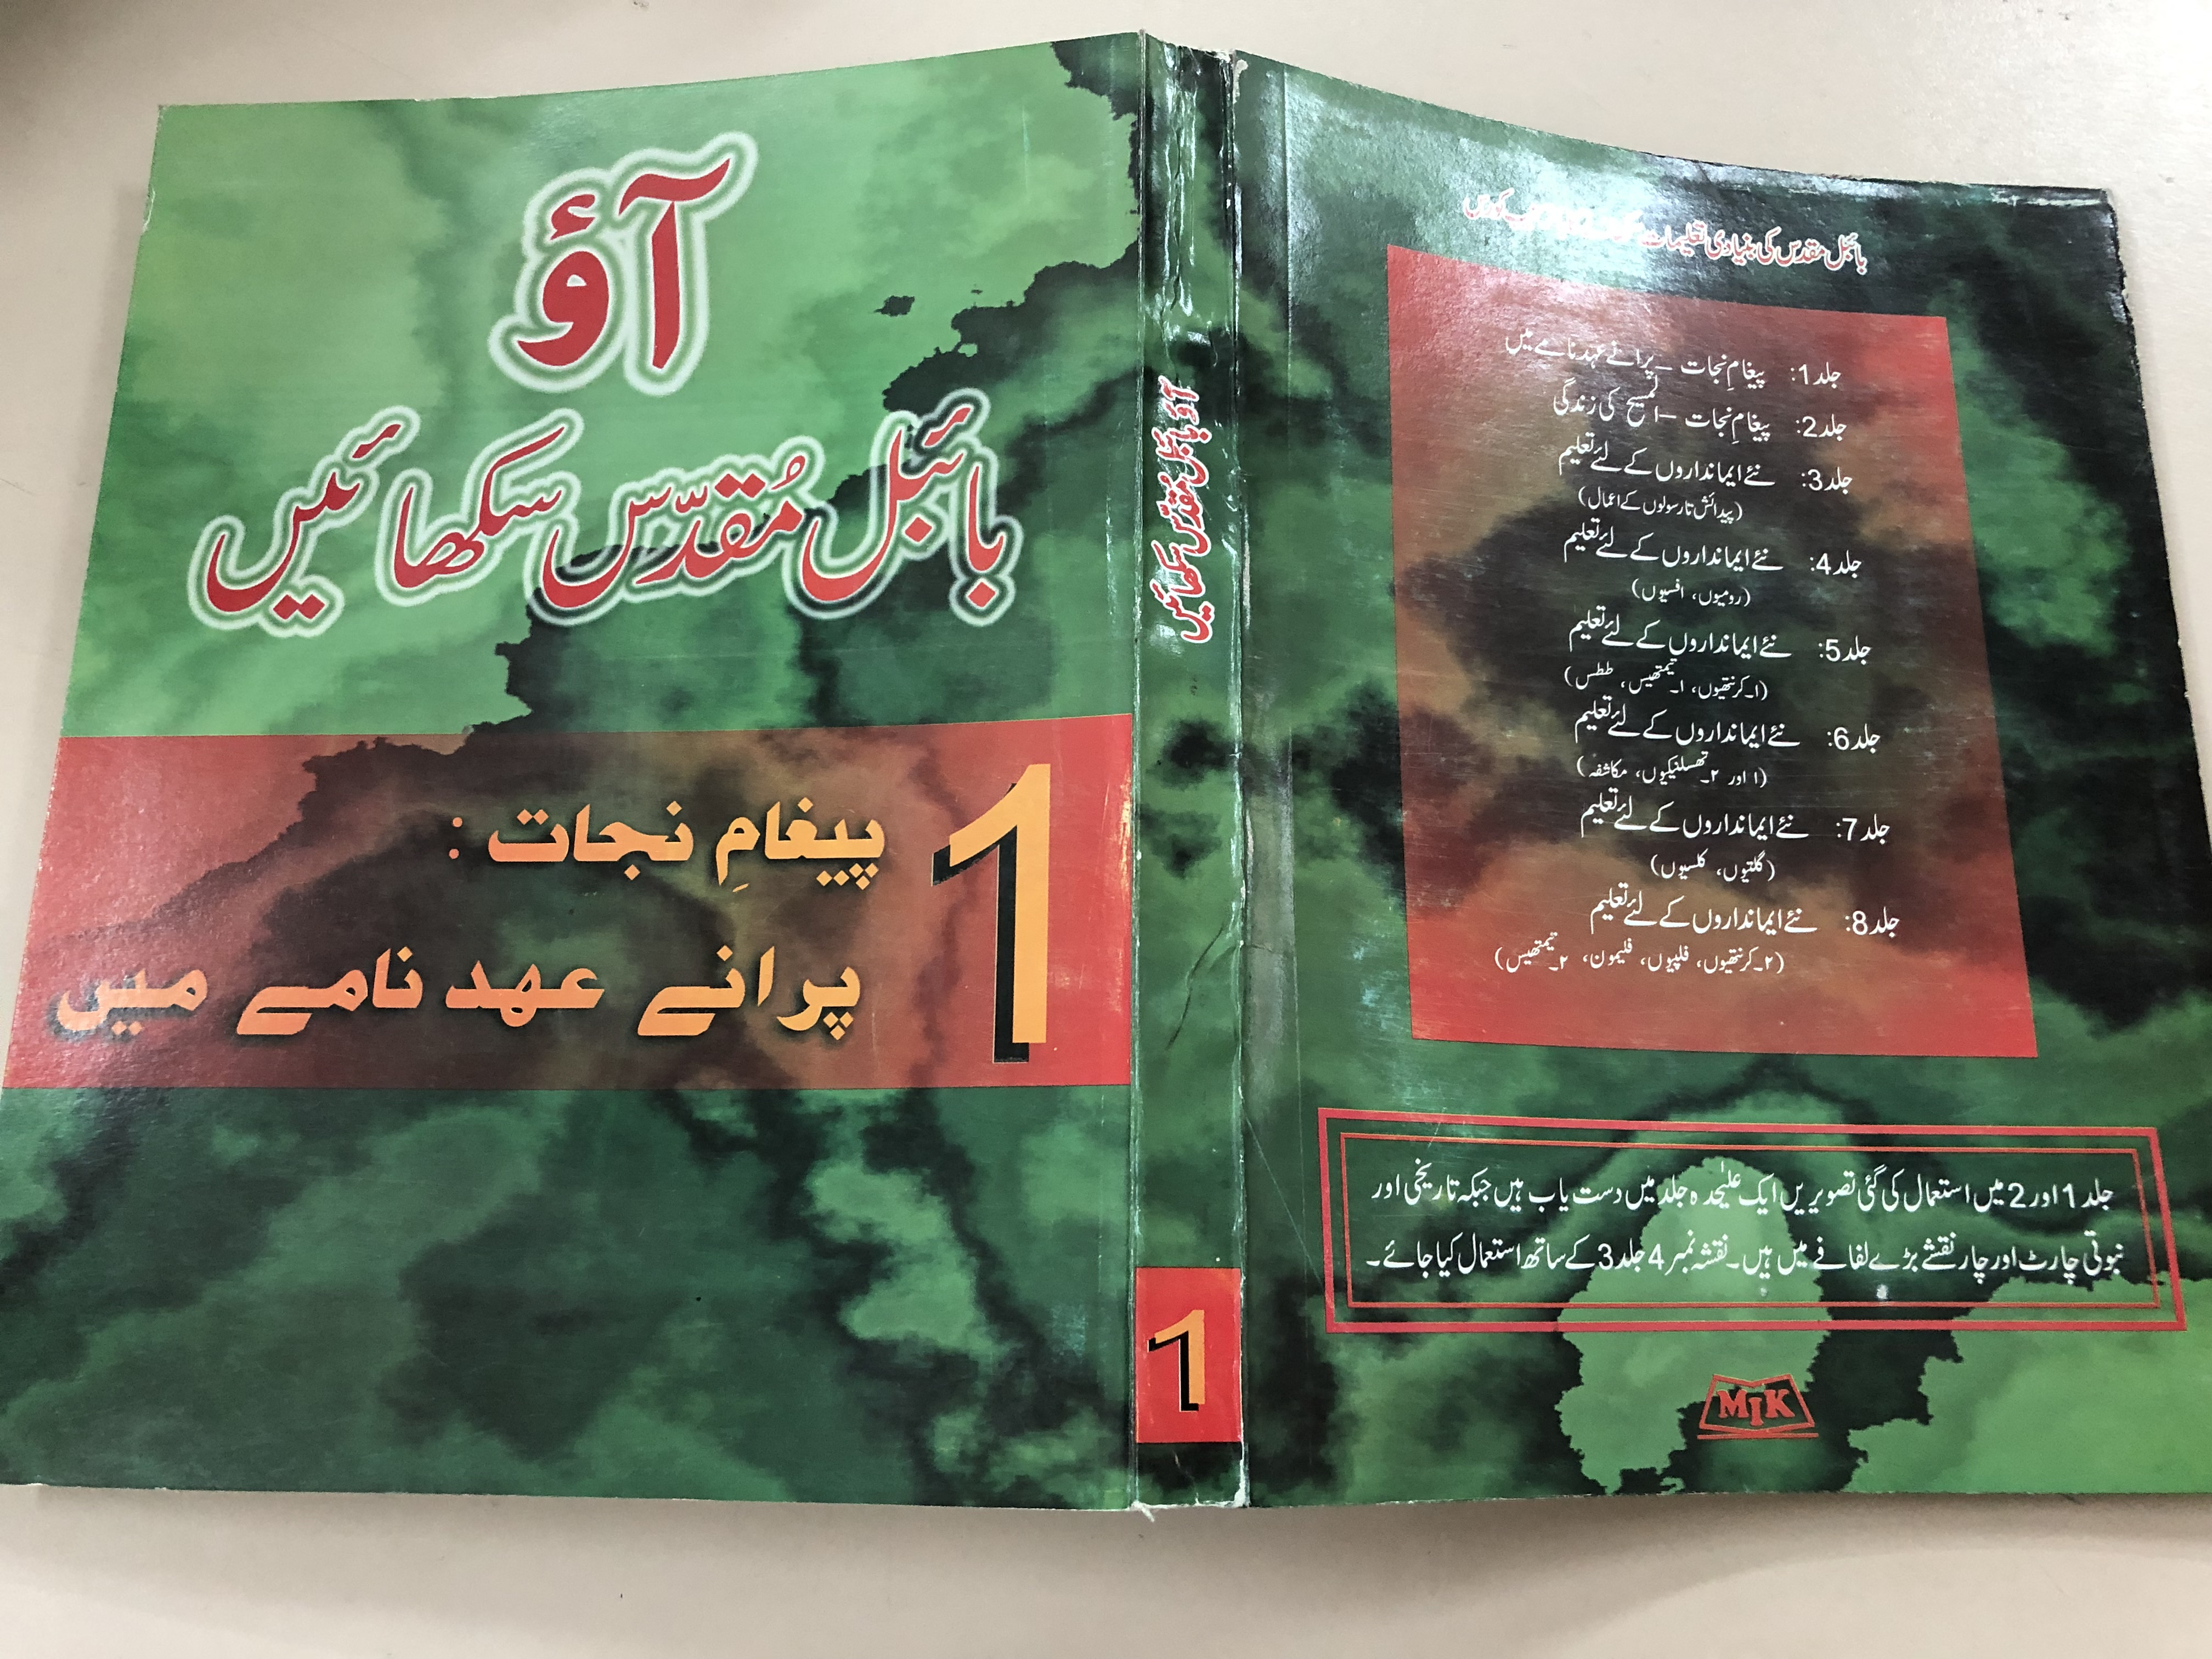 building-on-firm-foundations-vol.1-by-trevor-mcilwain-urdu-edition-evangelism-the-old-testament-pakistan-2007-13-.jpg